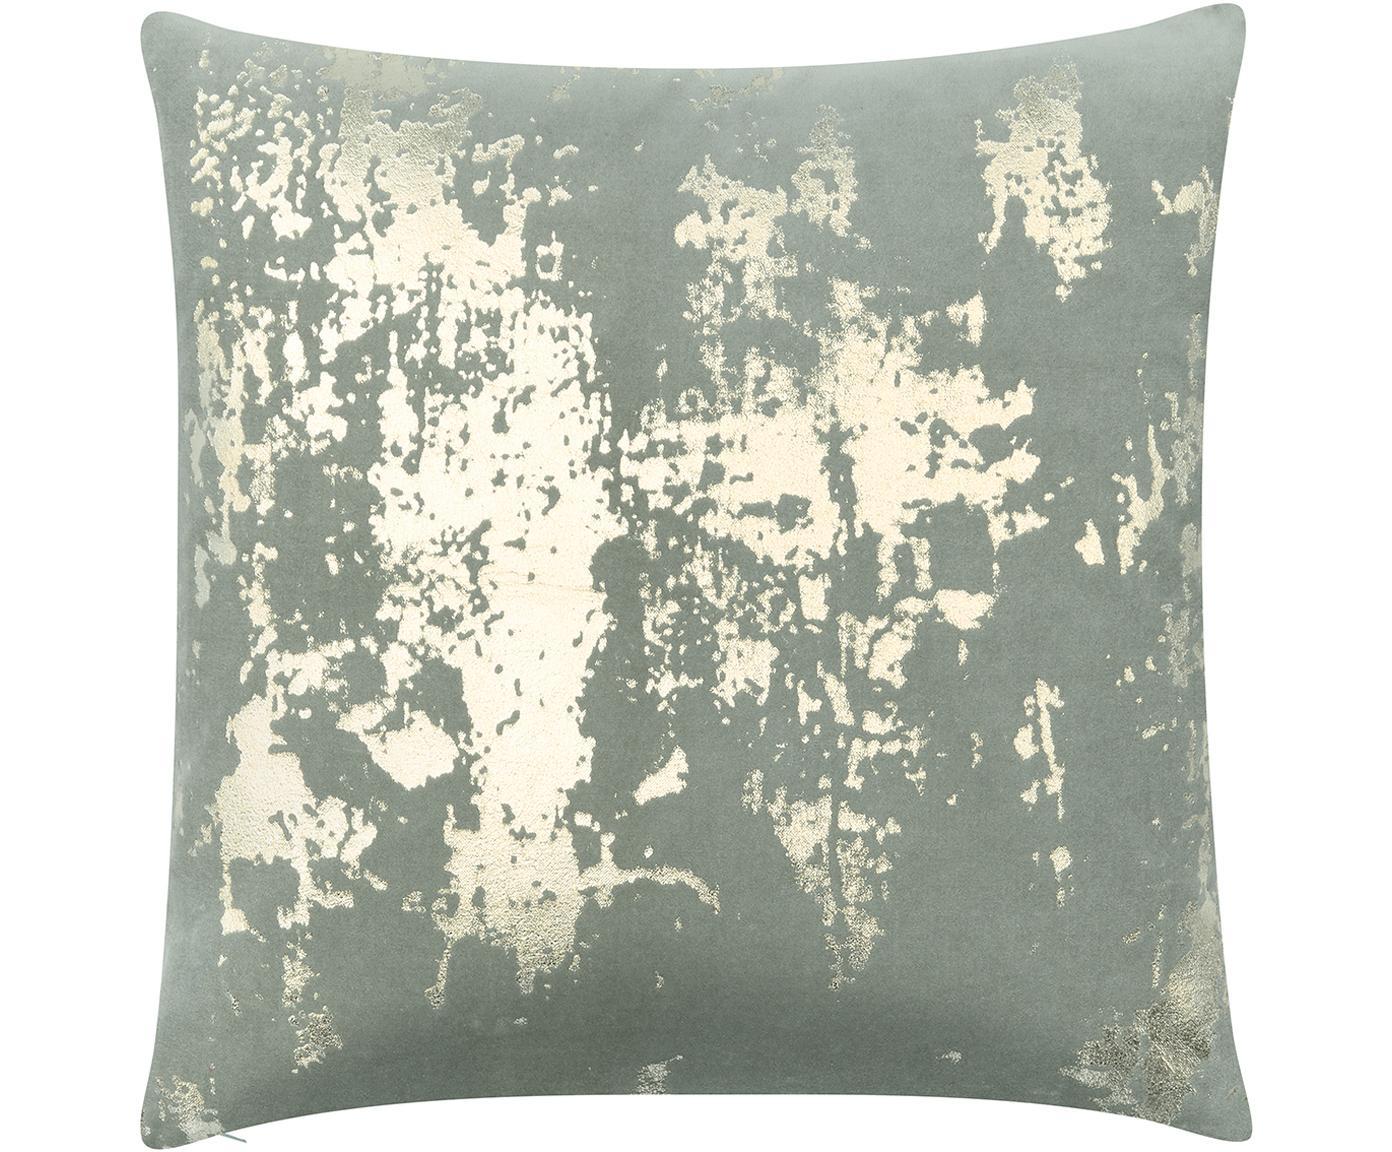 Funda de cojín de terciopeloShiny, estilo vintage, Terciopelo de algodón, Verde salvia, dorado, An 40 x L 40 cm